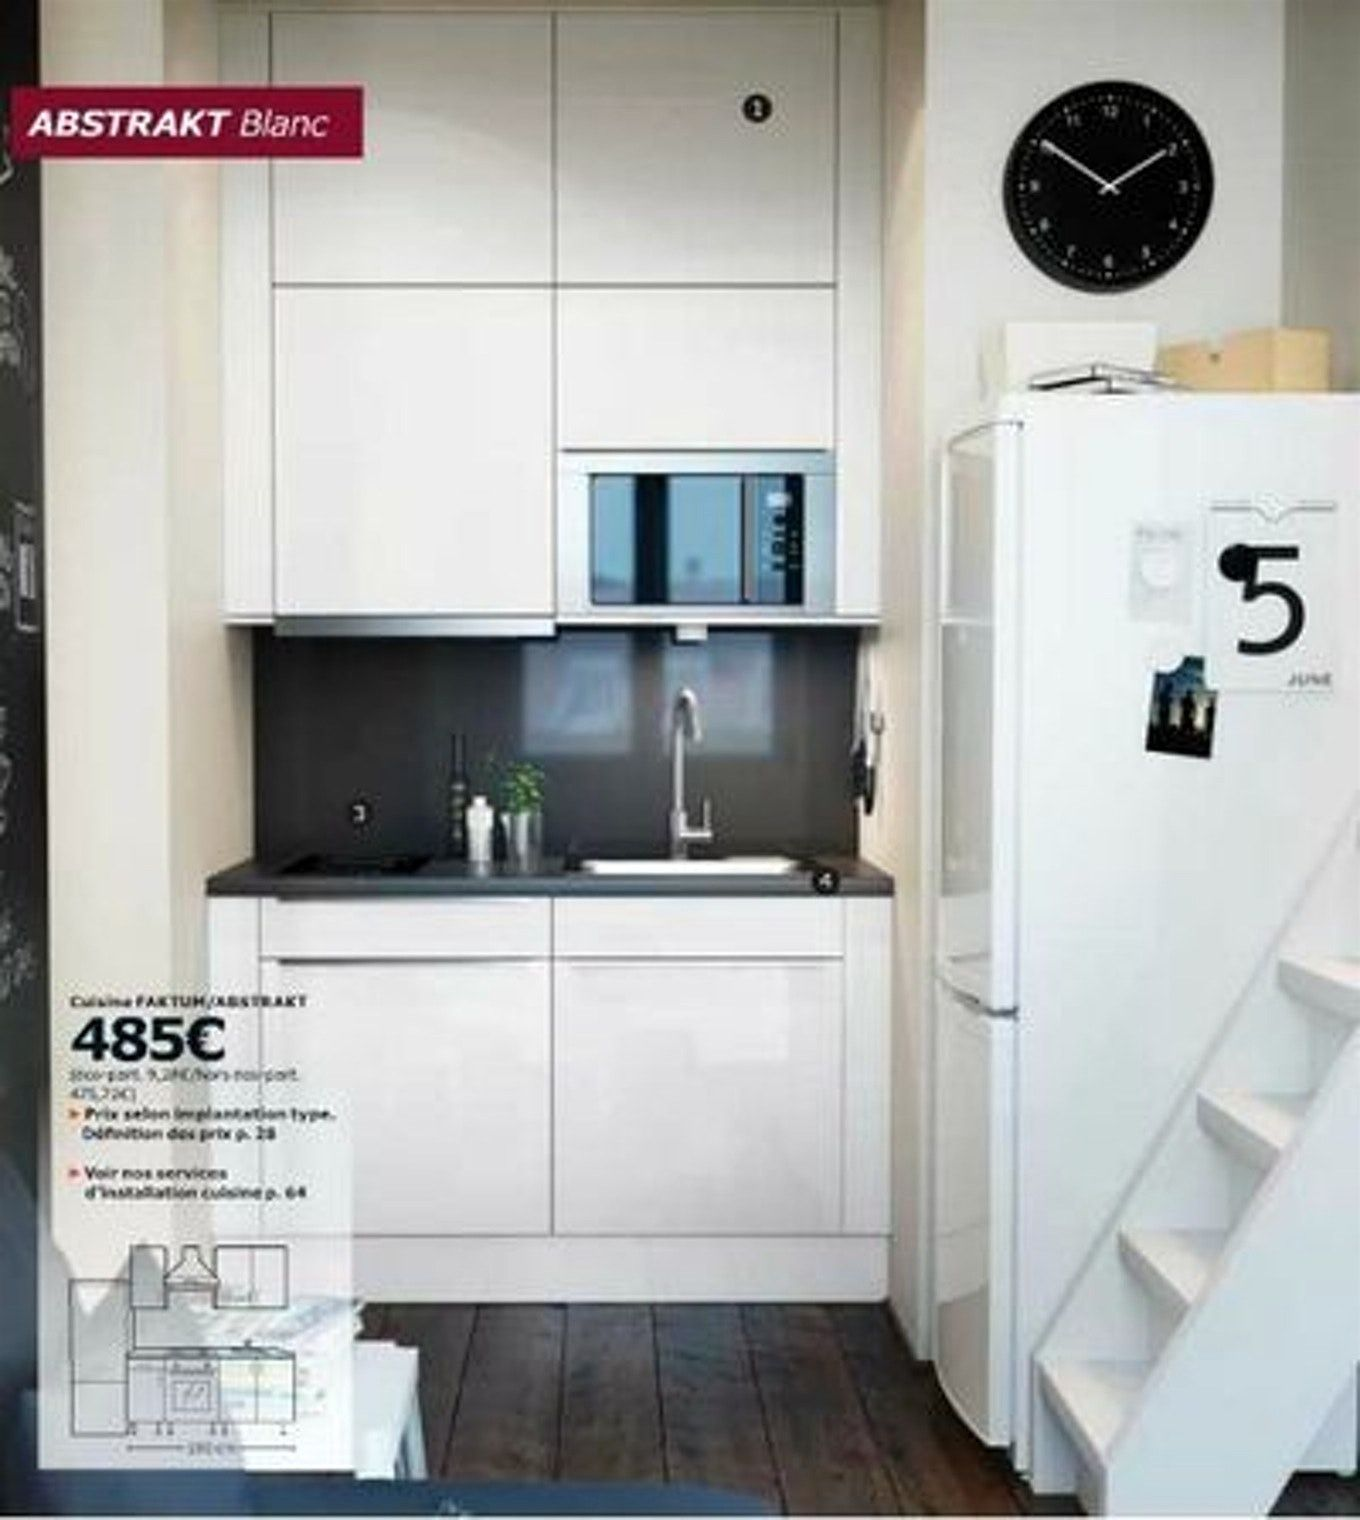 Kitchenette Ikea Pour Studio Avec Erstaunlich Amenagement